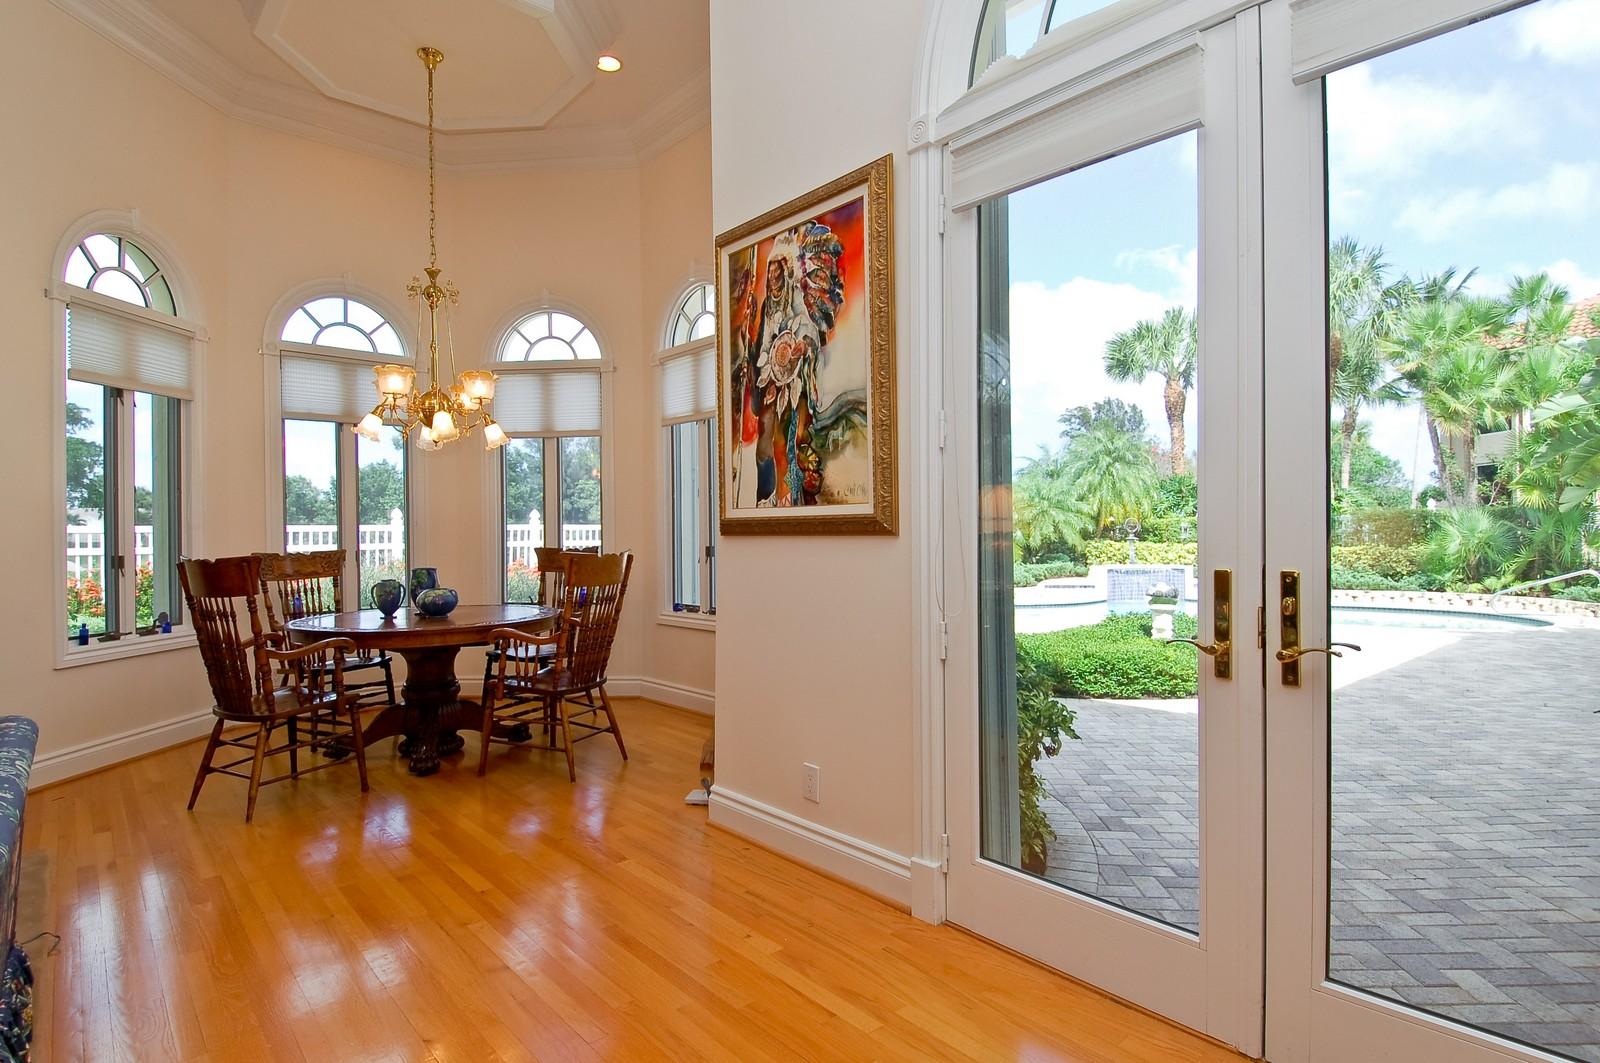 Real Estate Photography - 4252 Bocaire Blvd, Boca Raton, FL, 33487 - Breakfast Area